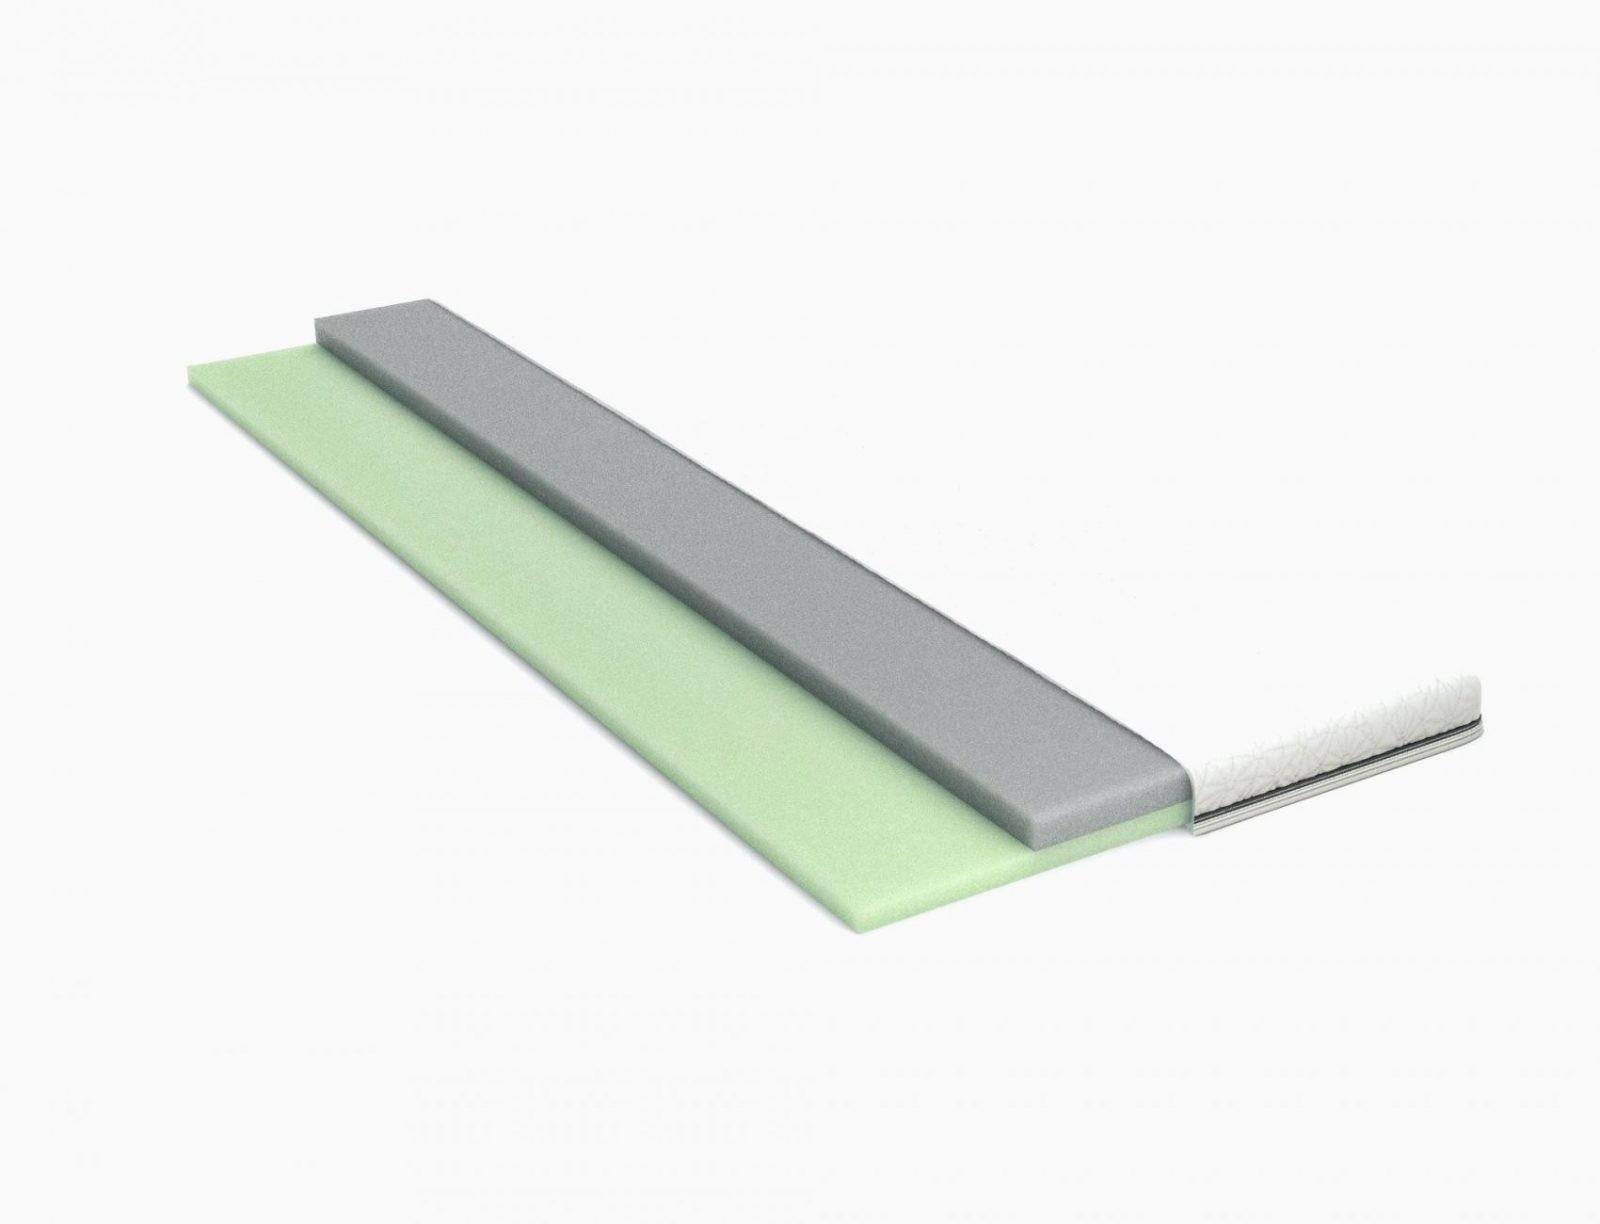 ikea topper 140x200 mooie matratzen topper test stiftung warentest von matratzen topper test. Black Bedroom Furniture Sets. Home Design Ideas